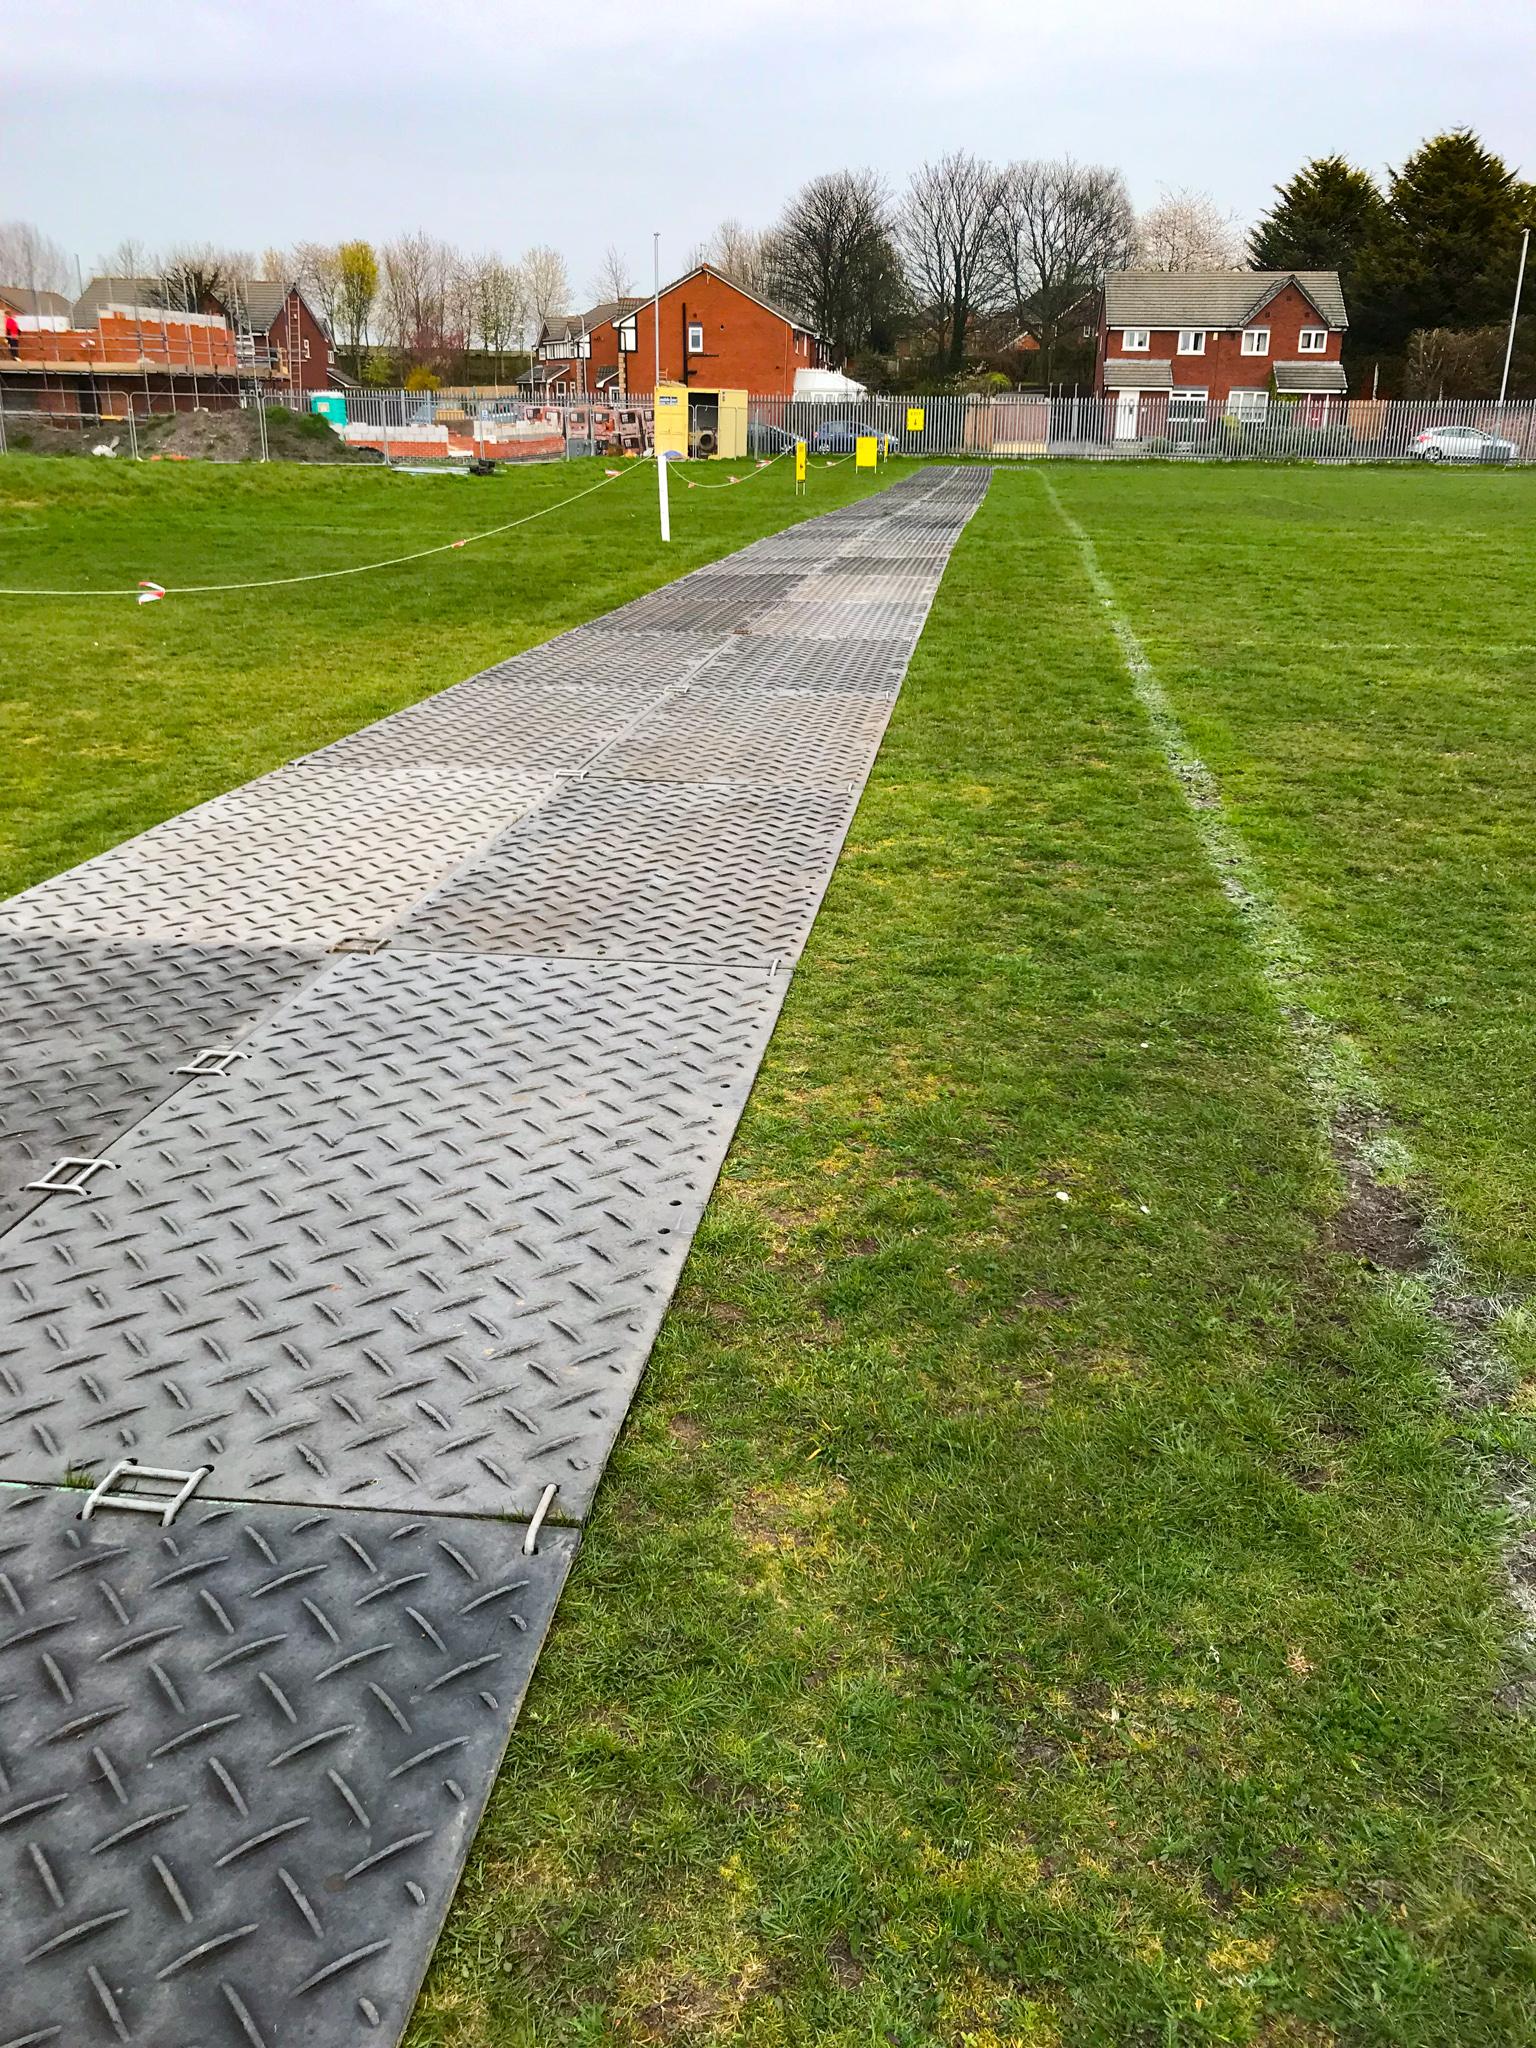 Groundmats